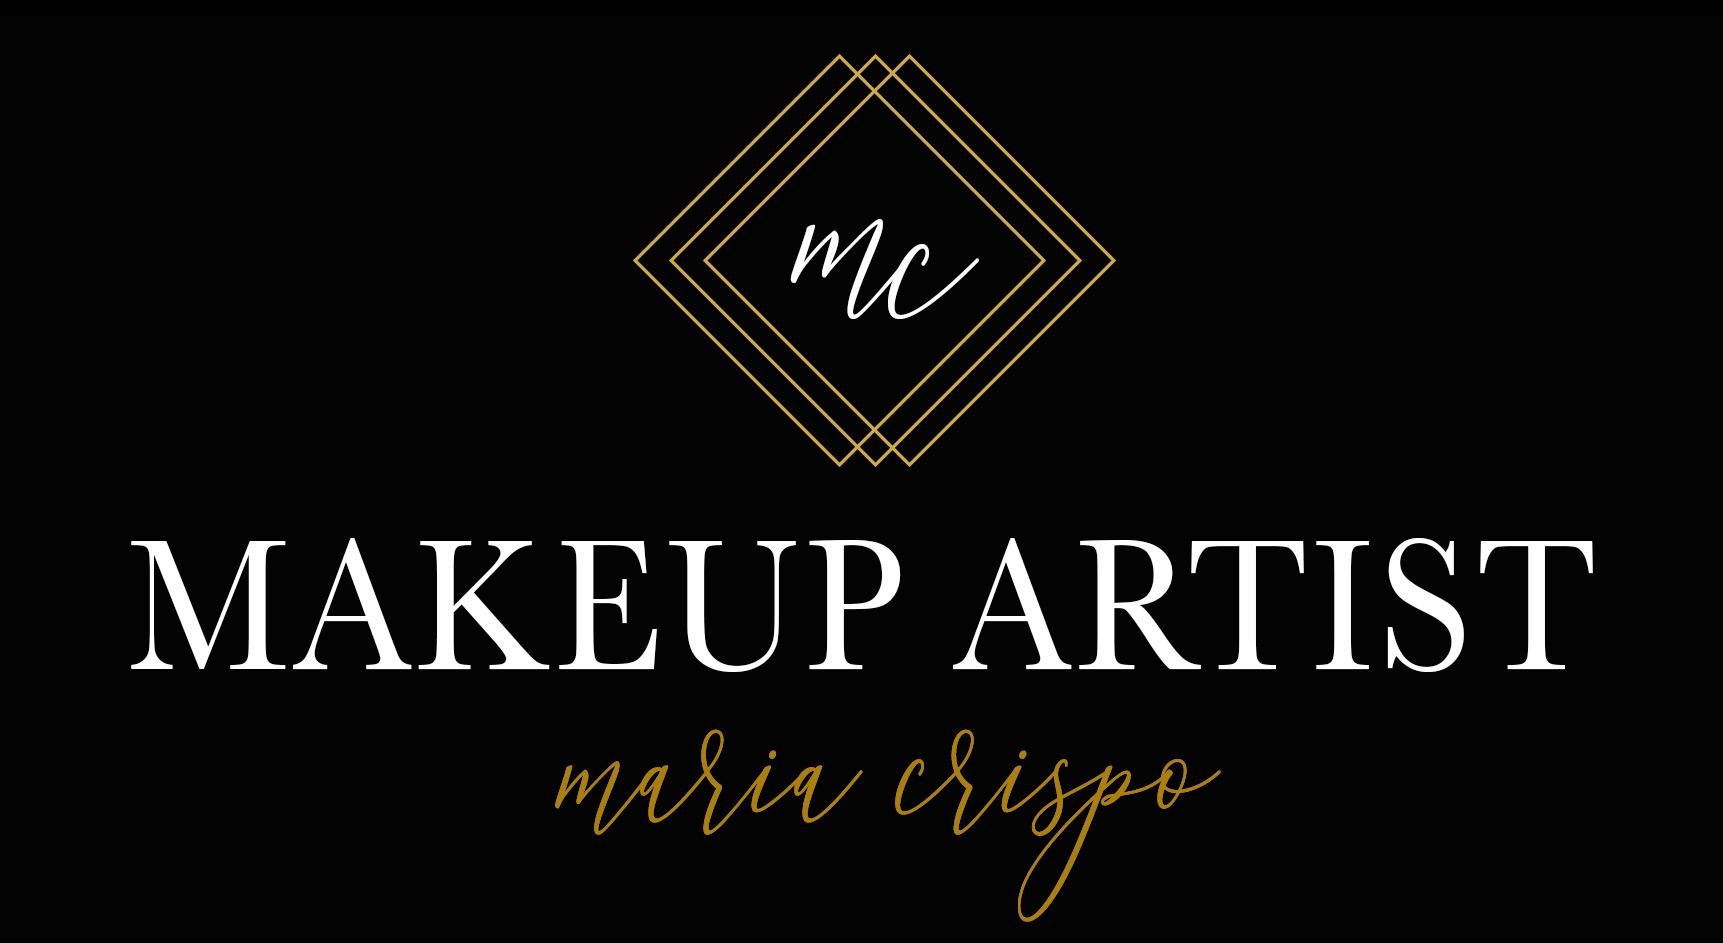 Makeup by Maria Crispo